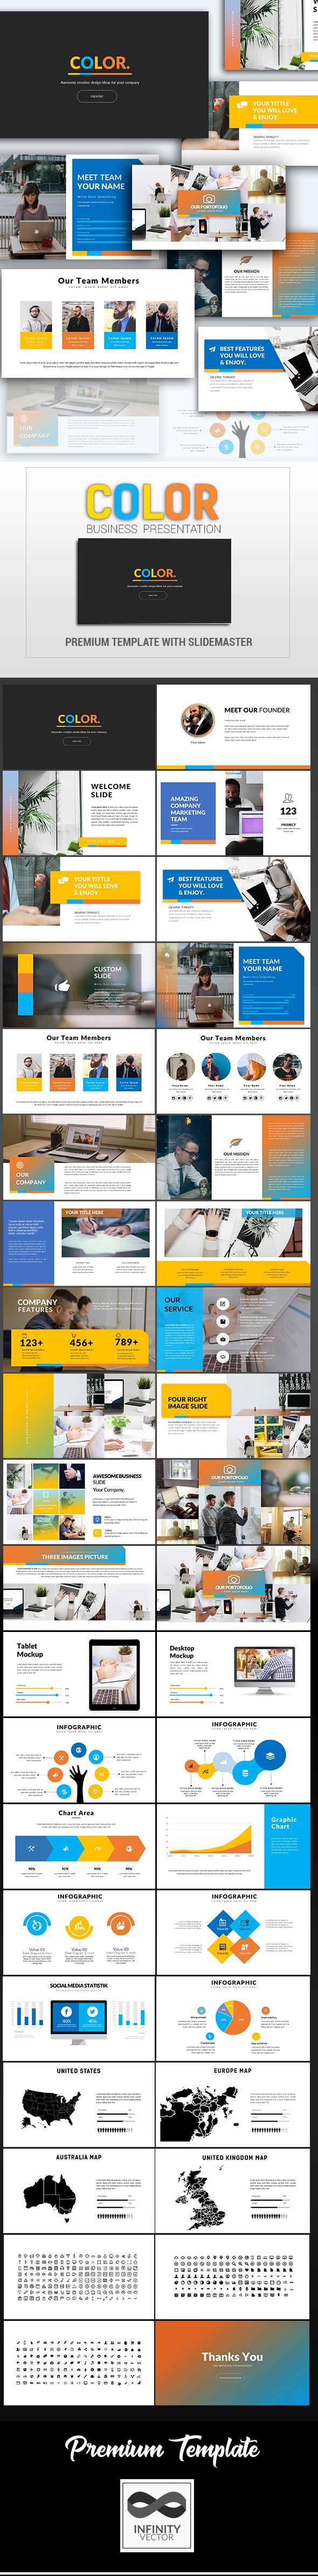 Color Multipurpose Presentation Keynote - Keynote Templates Presentation Templates